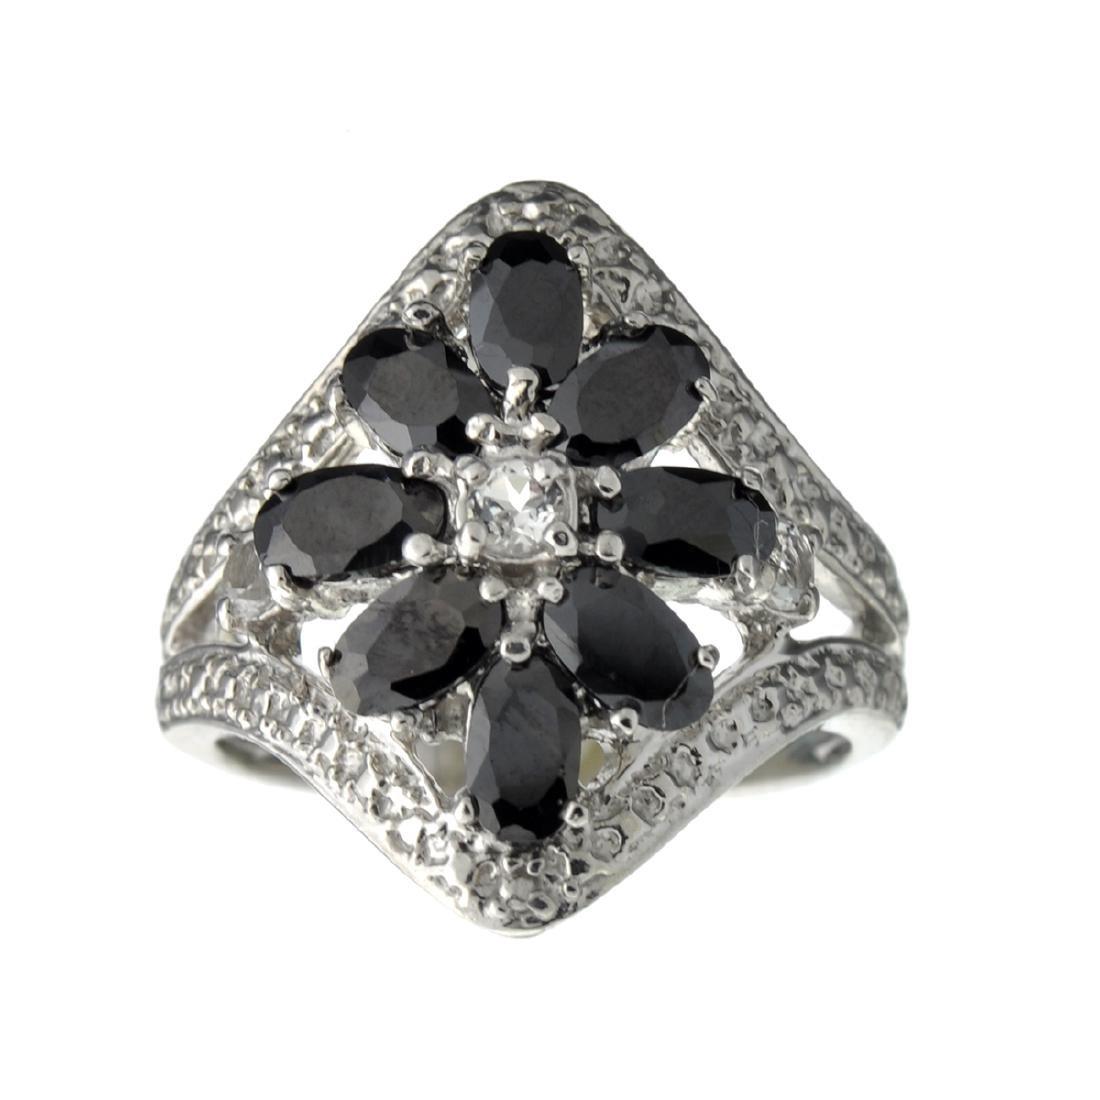 Rare Designer Sebastian Vintage, Sapphires And Sterling